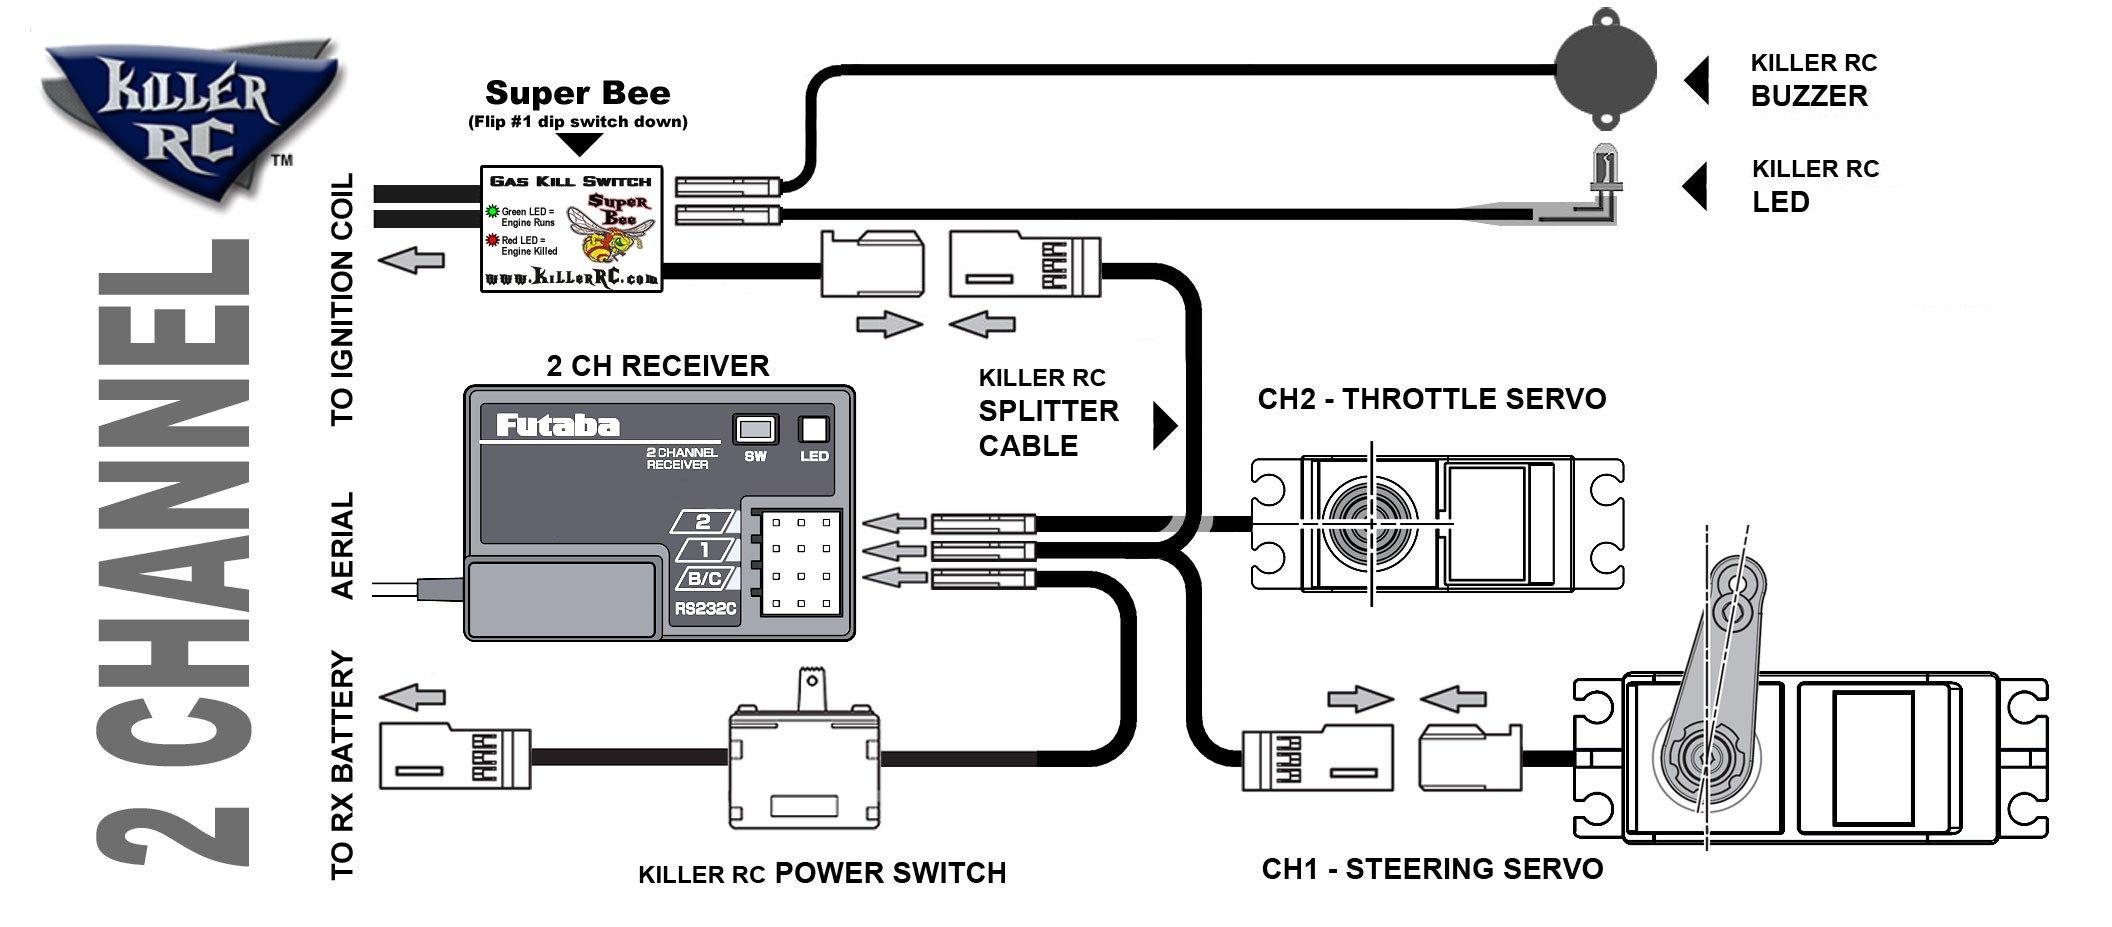 HV_0713 Diagram For A Car Kill Switch Including Rc Boat Motor Wiring  Diagram Wiring Diagram [ 927 x 2112 Pixel ]